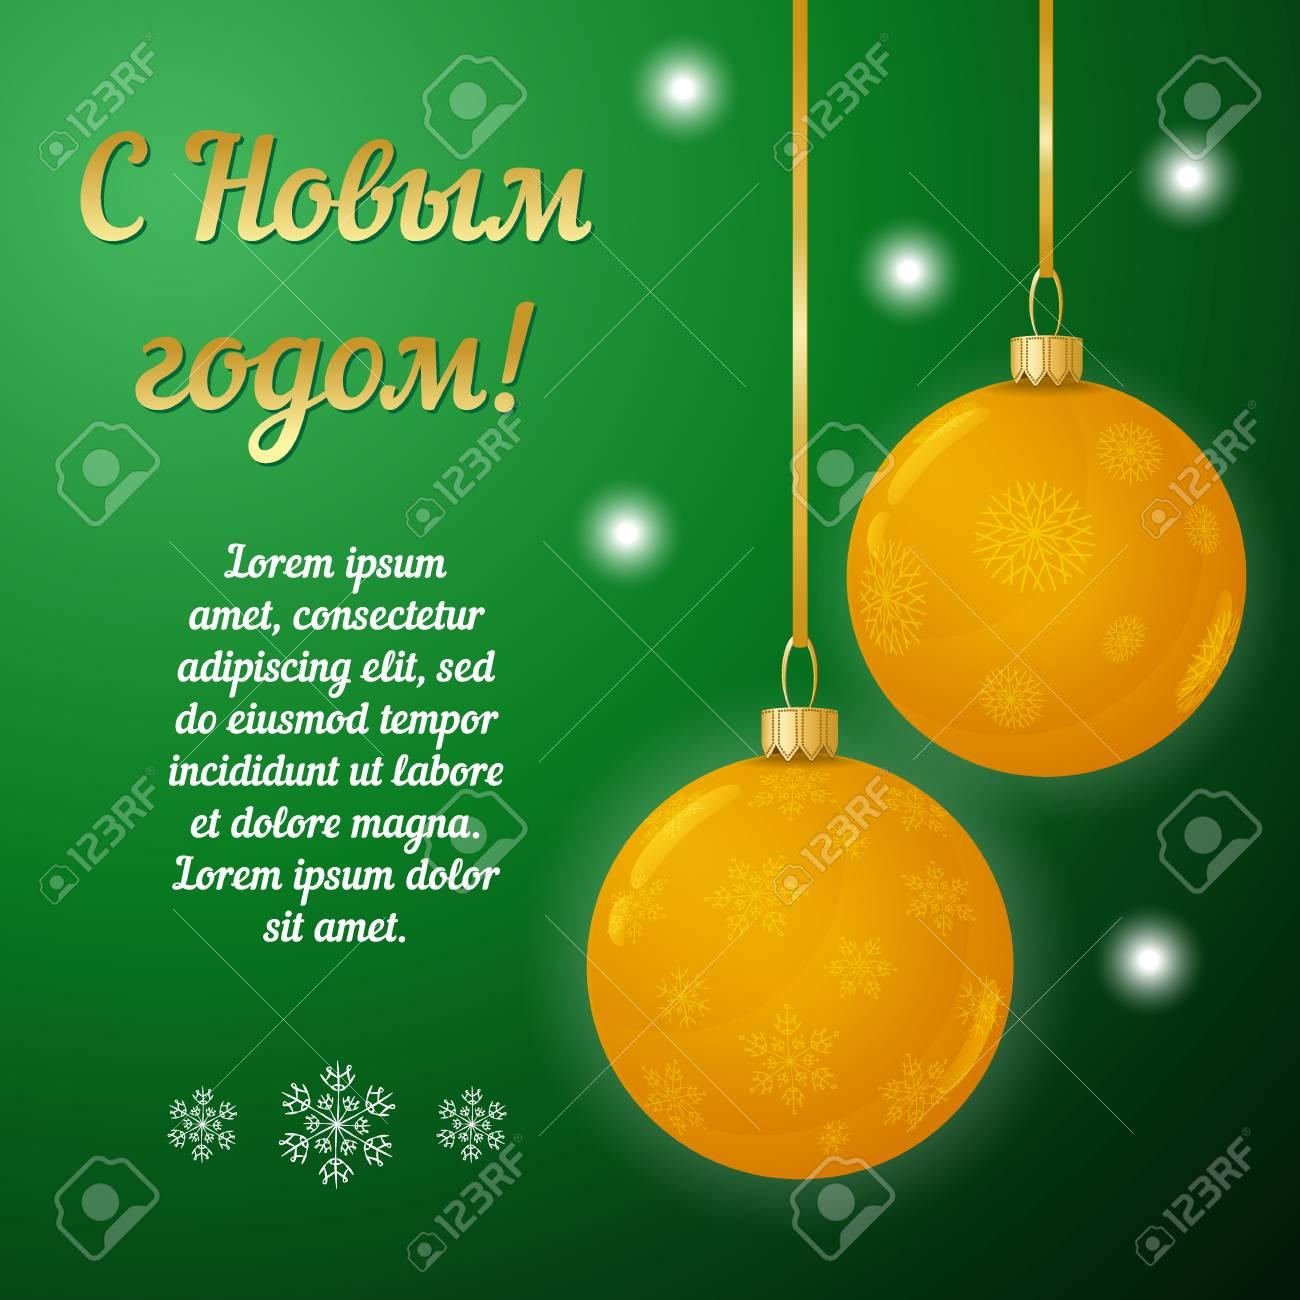 Traduction de decoration de noel